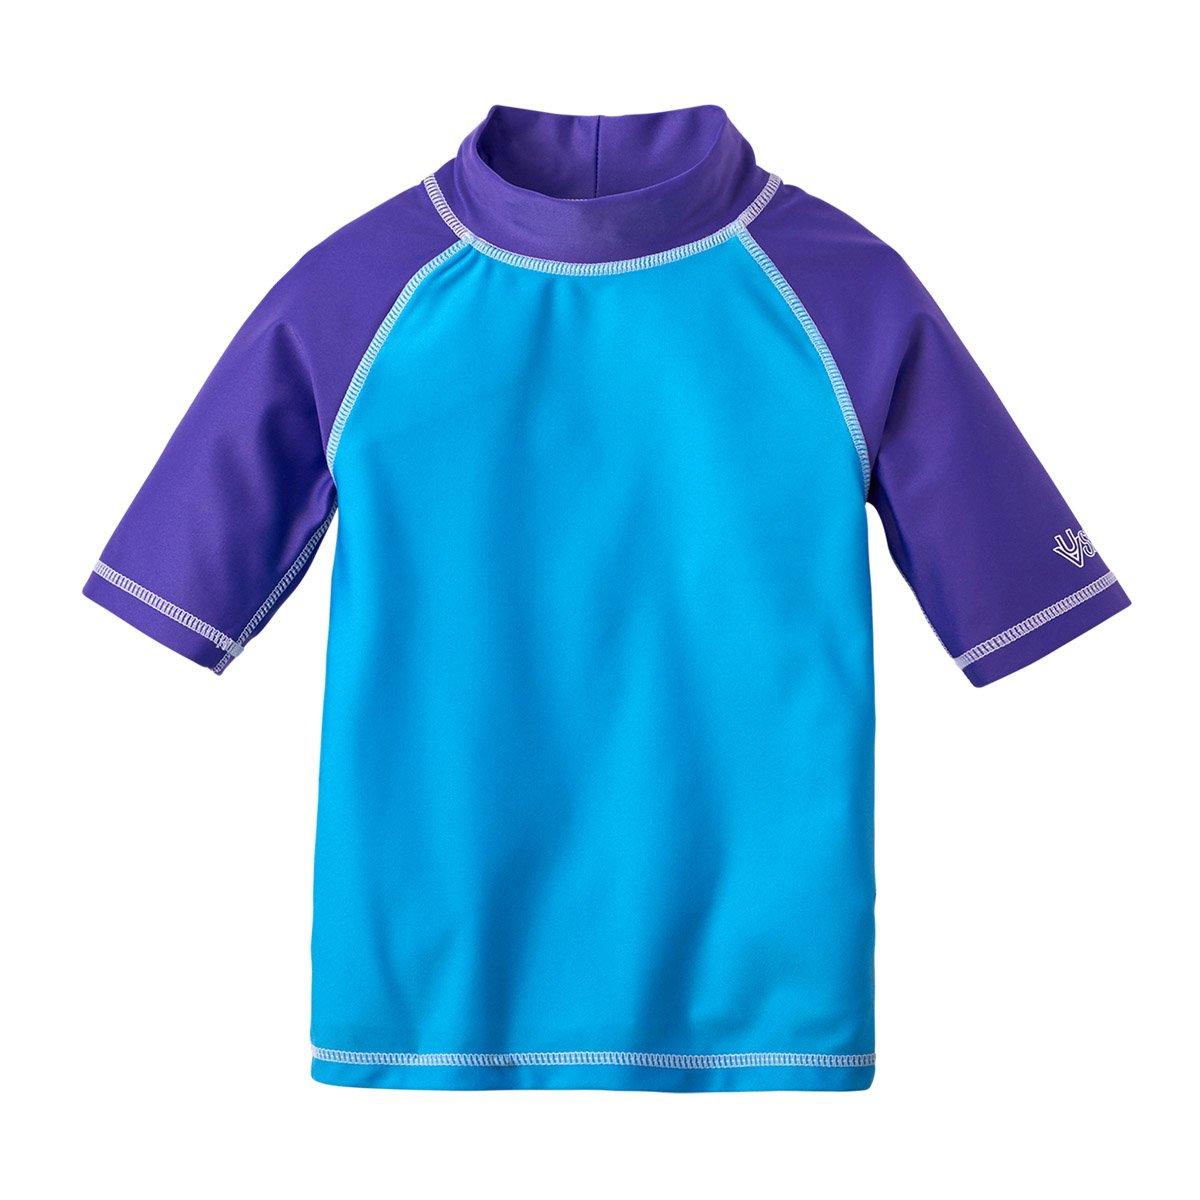 Fabric UPF 50 Mock Tee Neckline UV Skinz Girls Short Sleeve Sun /& Swim Shirt